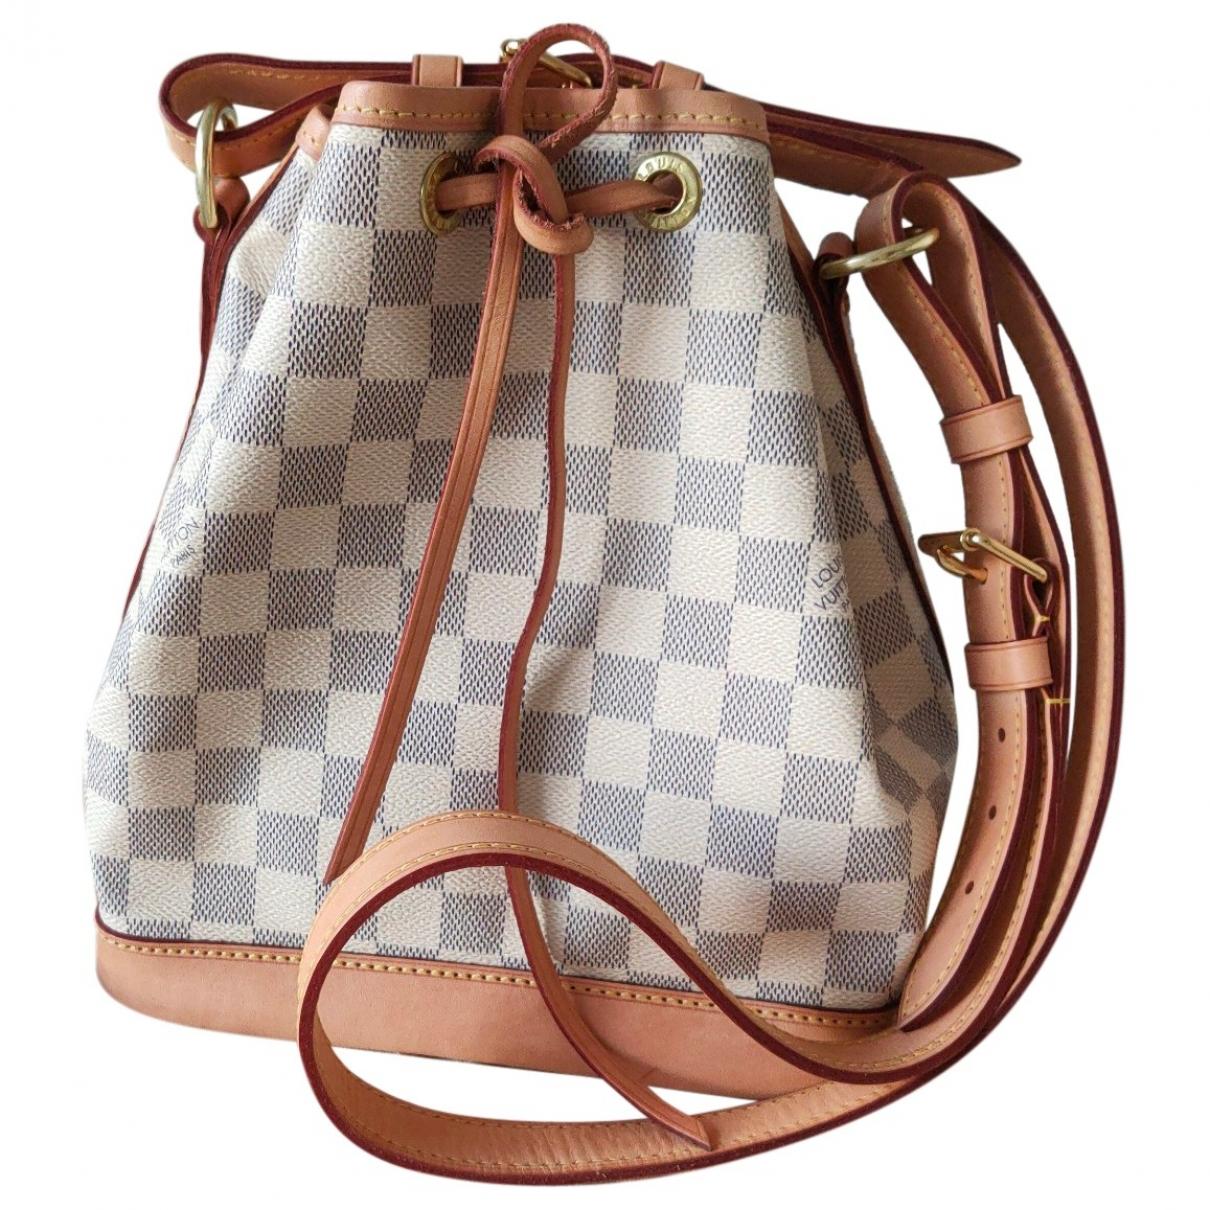 Louis Vuitton Noe Handtasche in  Ecru Leinen